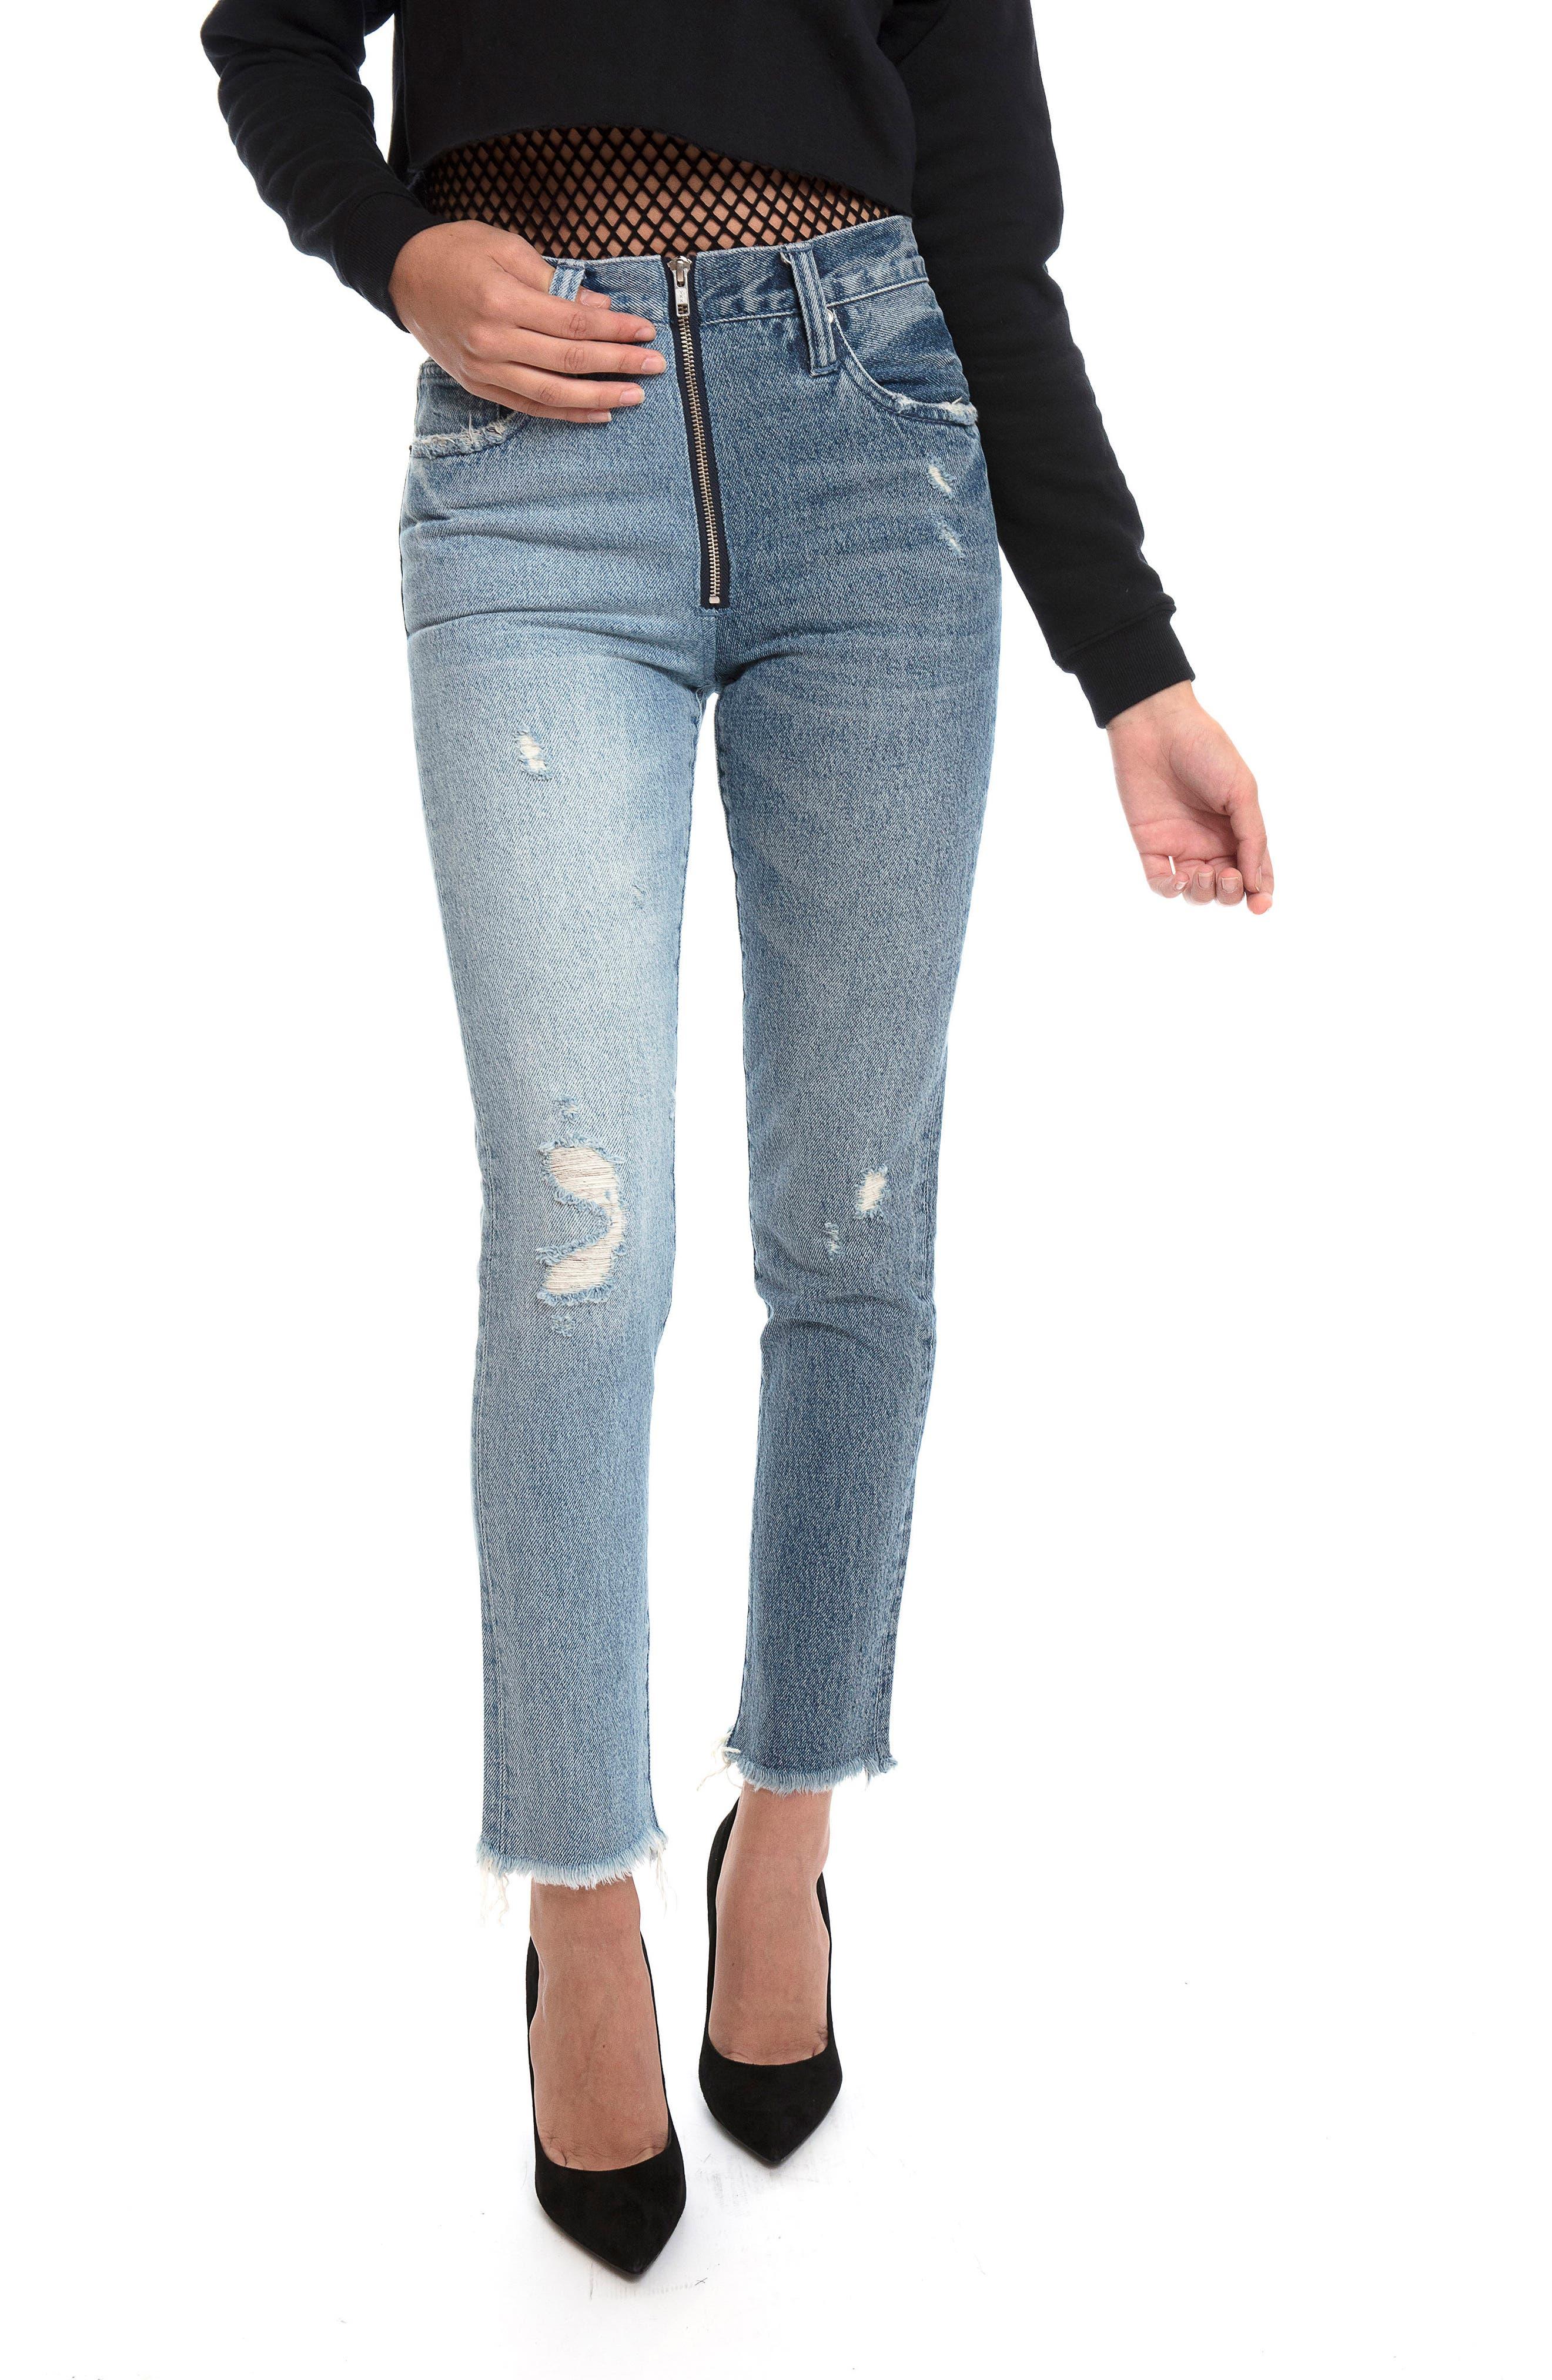 Chevelle Ankle Skinny Jeans,                             Alternate thumbnail 4, color,                             Indigo